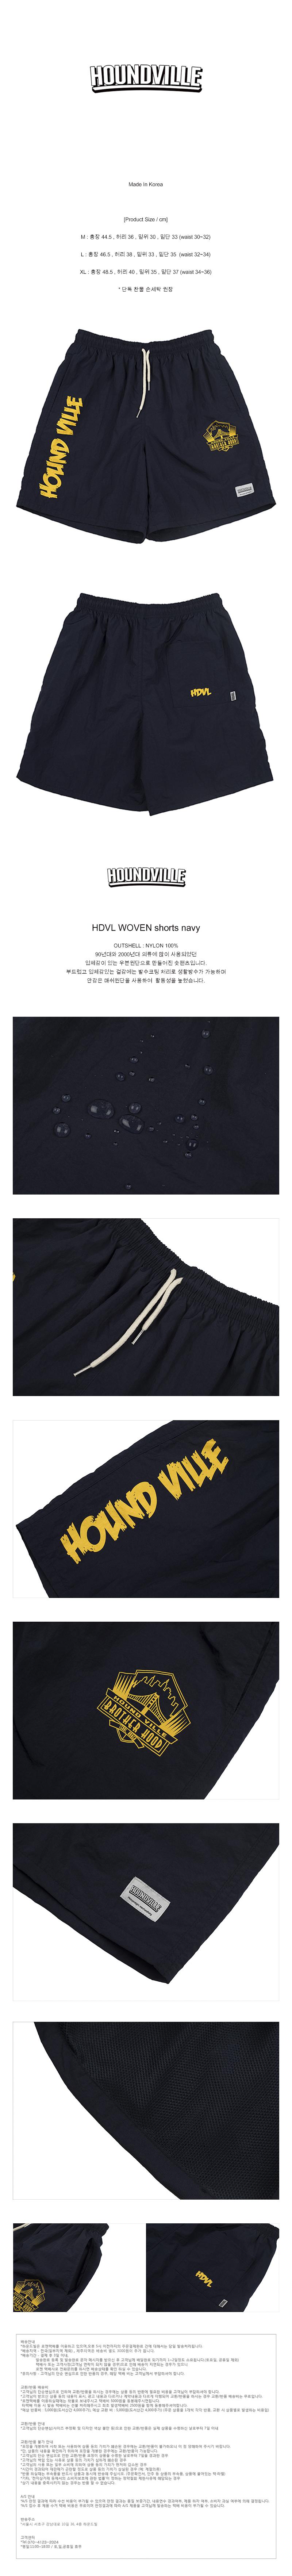 HDVL WOVEN shorts navy.jpg